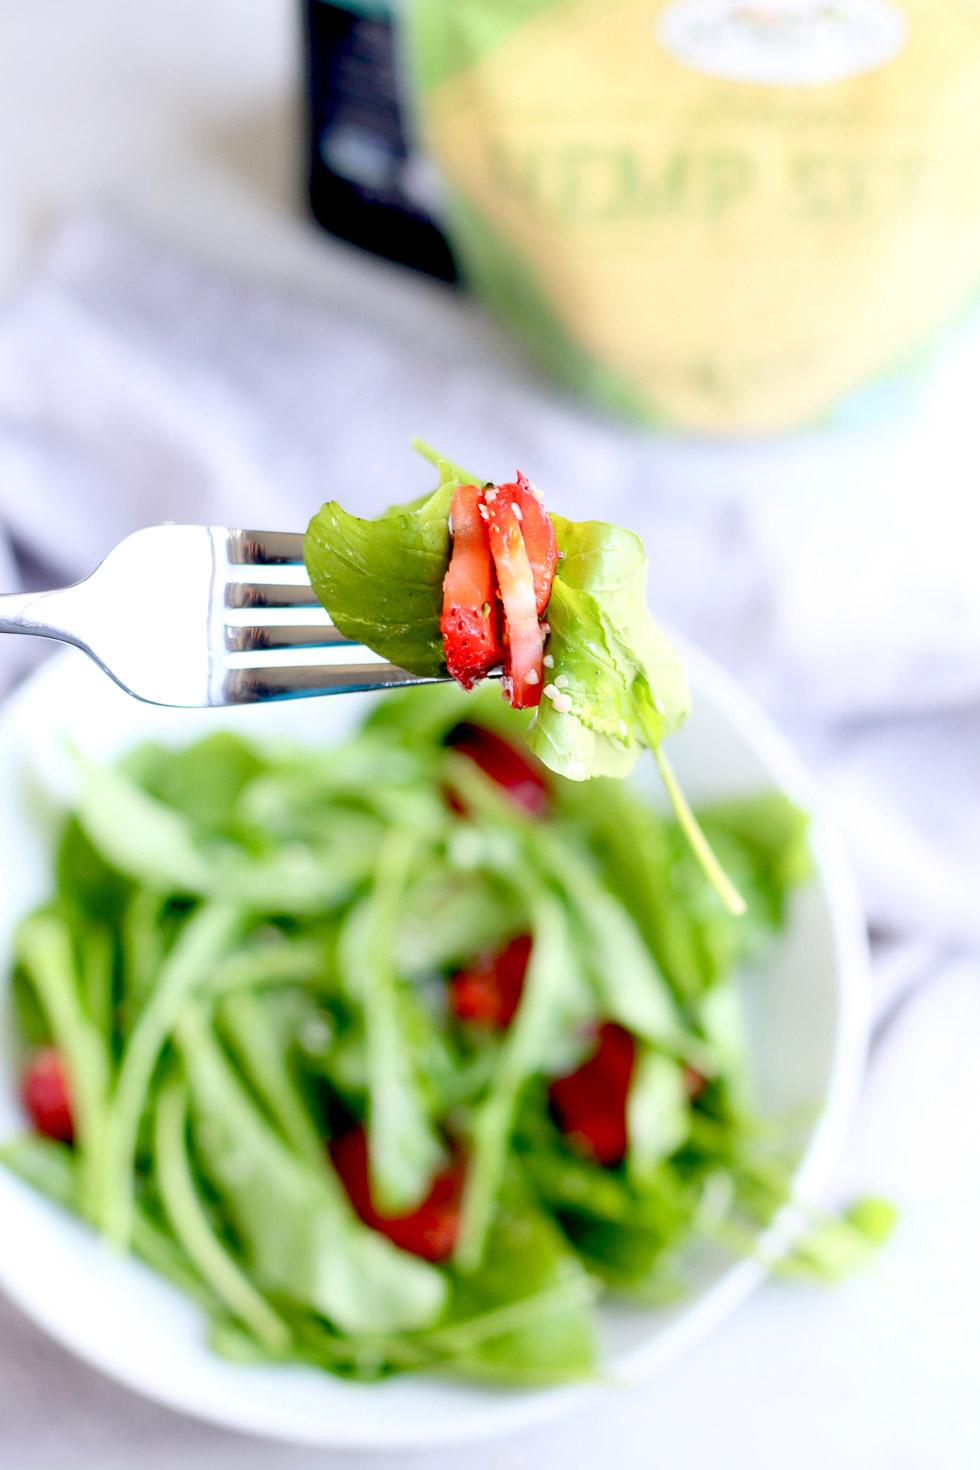 Strawberry Arugula Salad with Hemp Seeds on Fork